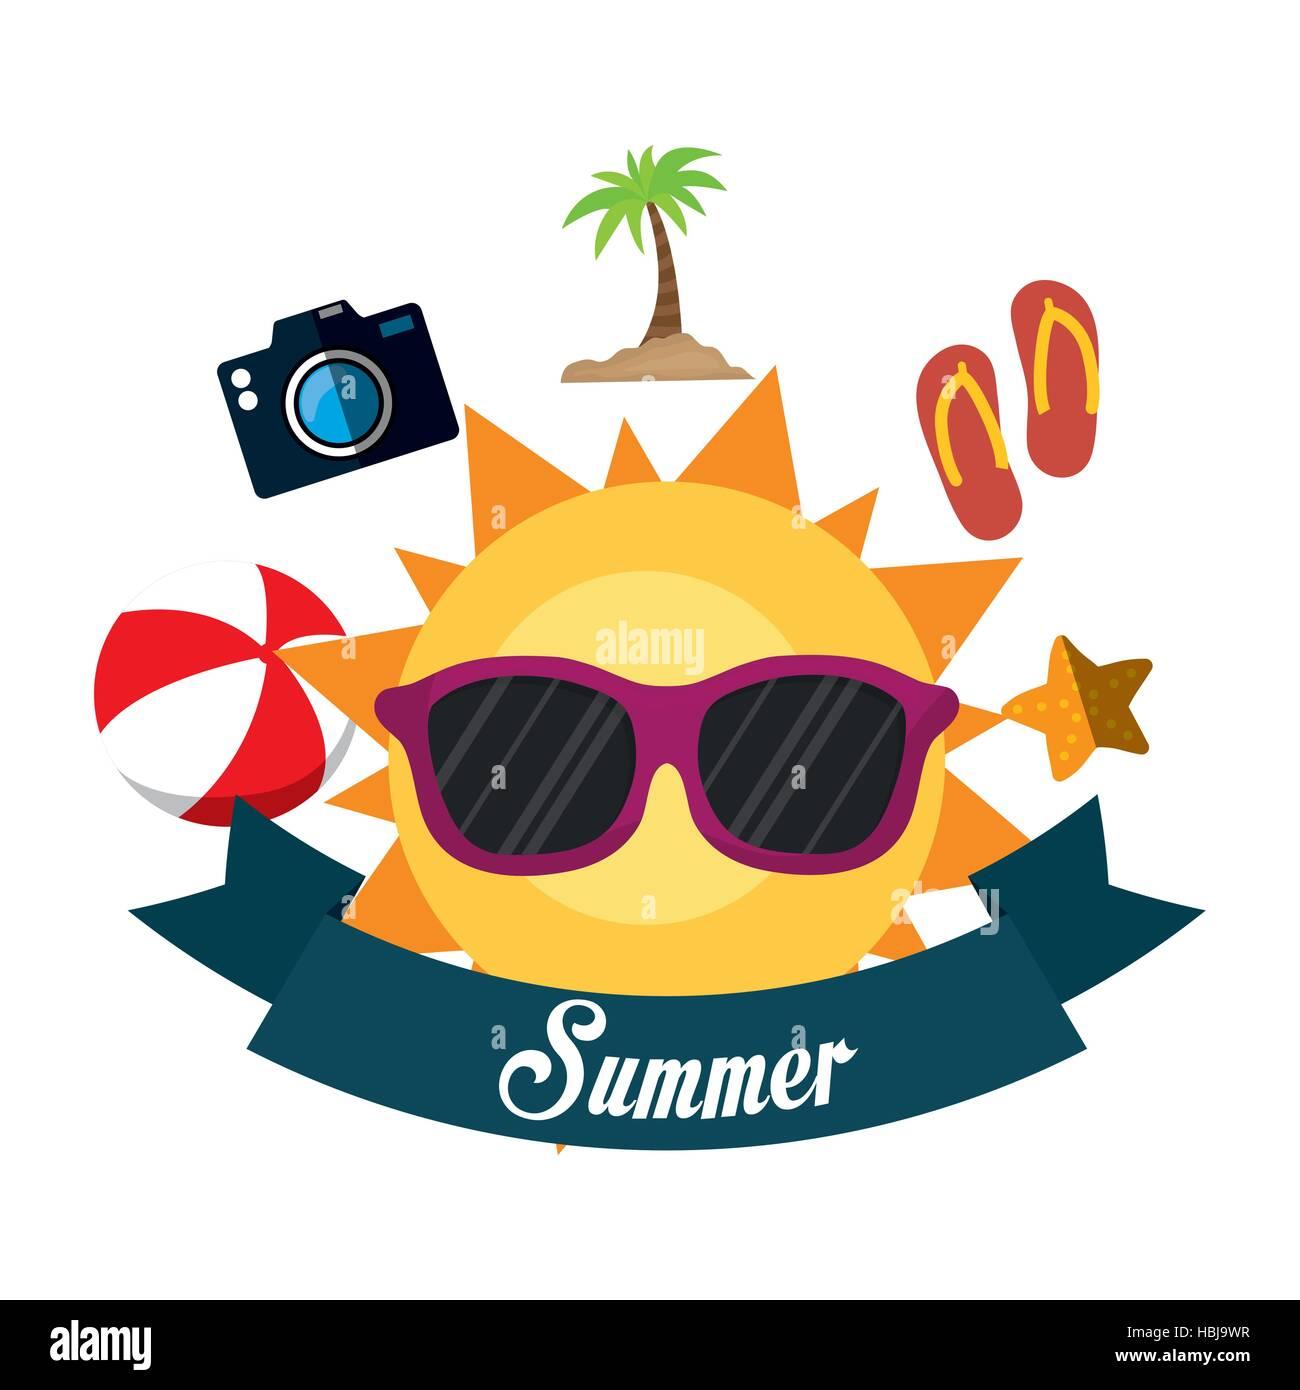 f6a0bca81f7f poster summer fun sun glasses ball flip flop camera banner vector  illustration eps 10